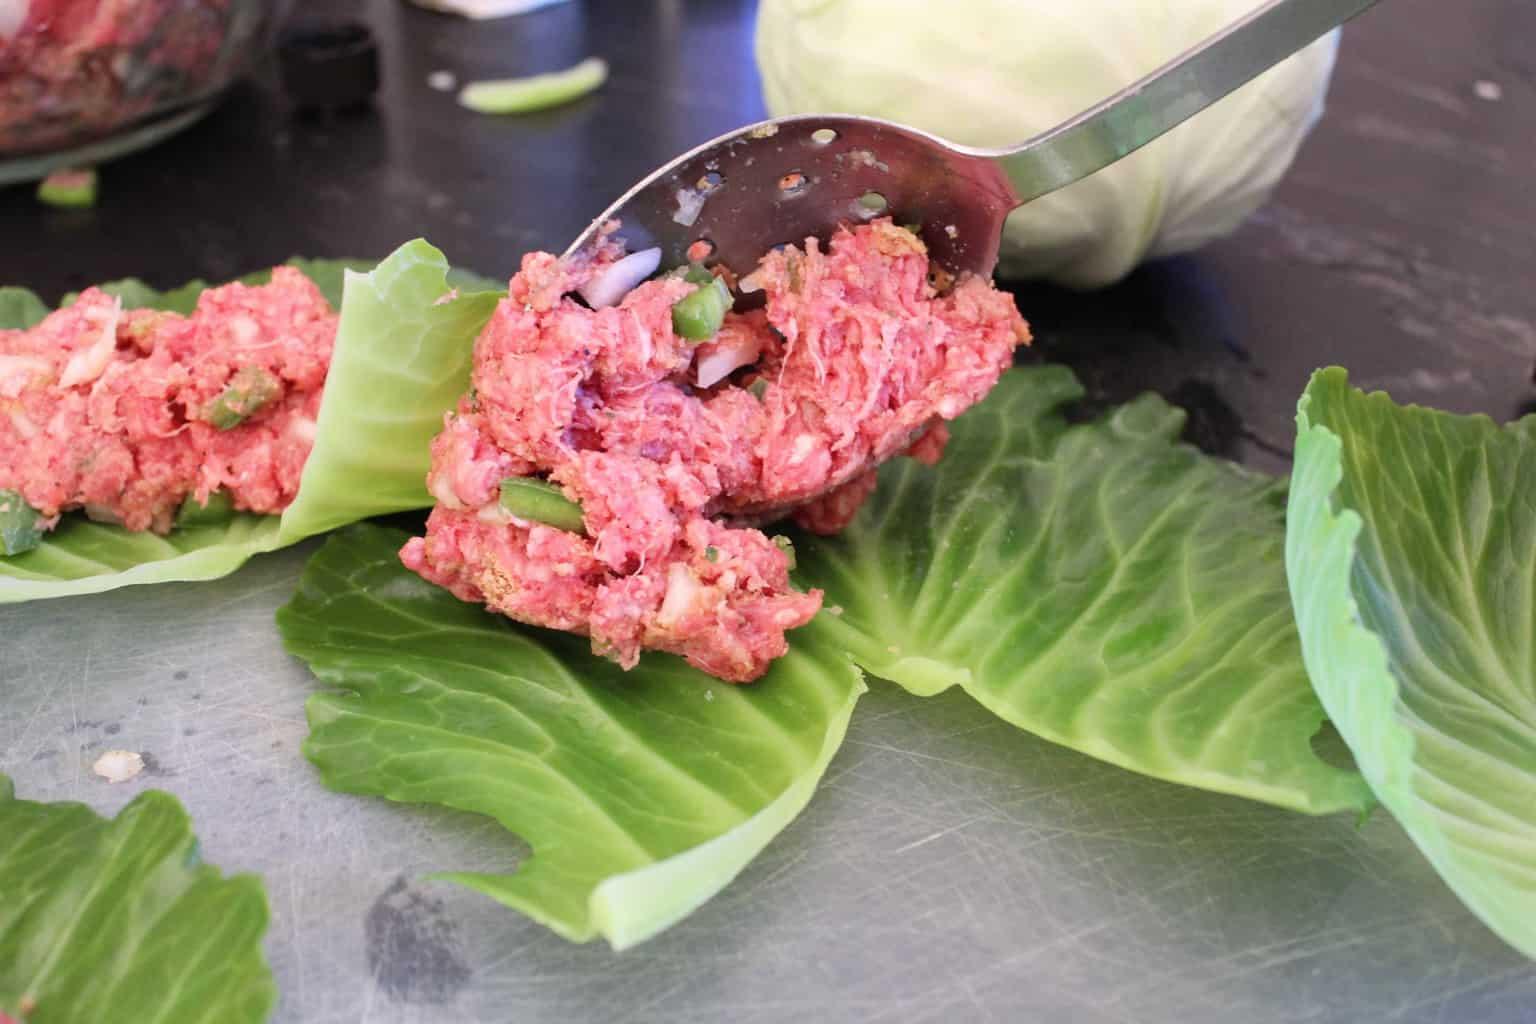 Meat mixture being spooned onto leaf.